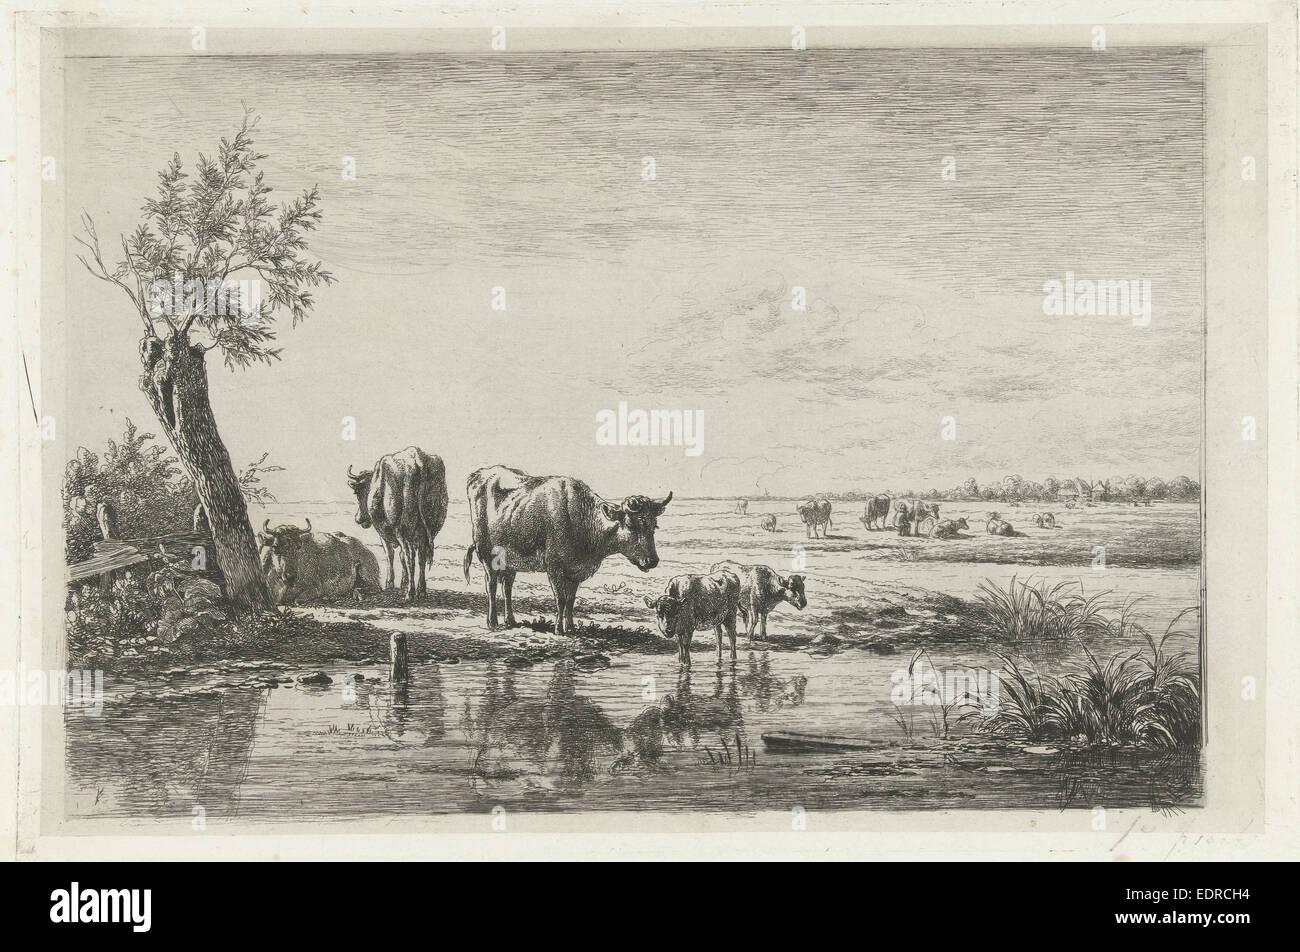 Wiesen mit Kühen am Wasser, Simon van Den Berg, 1822-1891 Stockbild